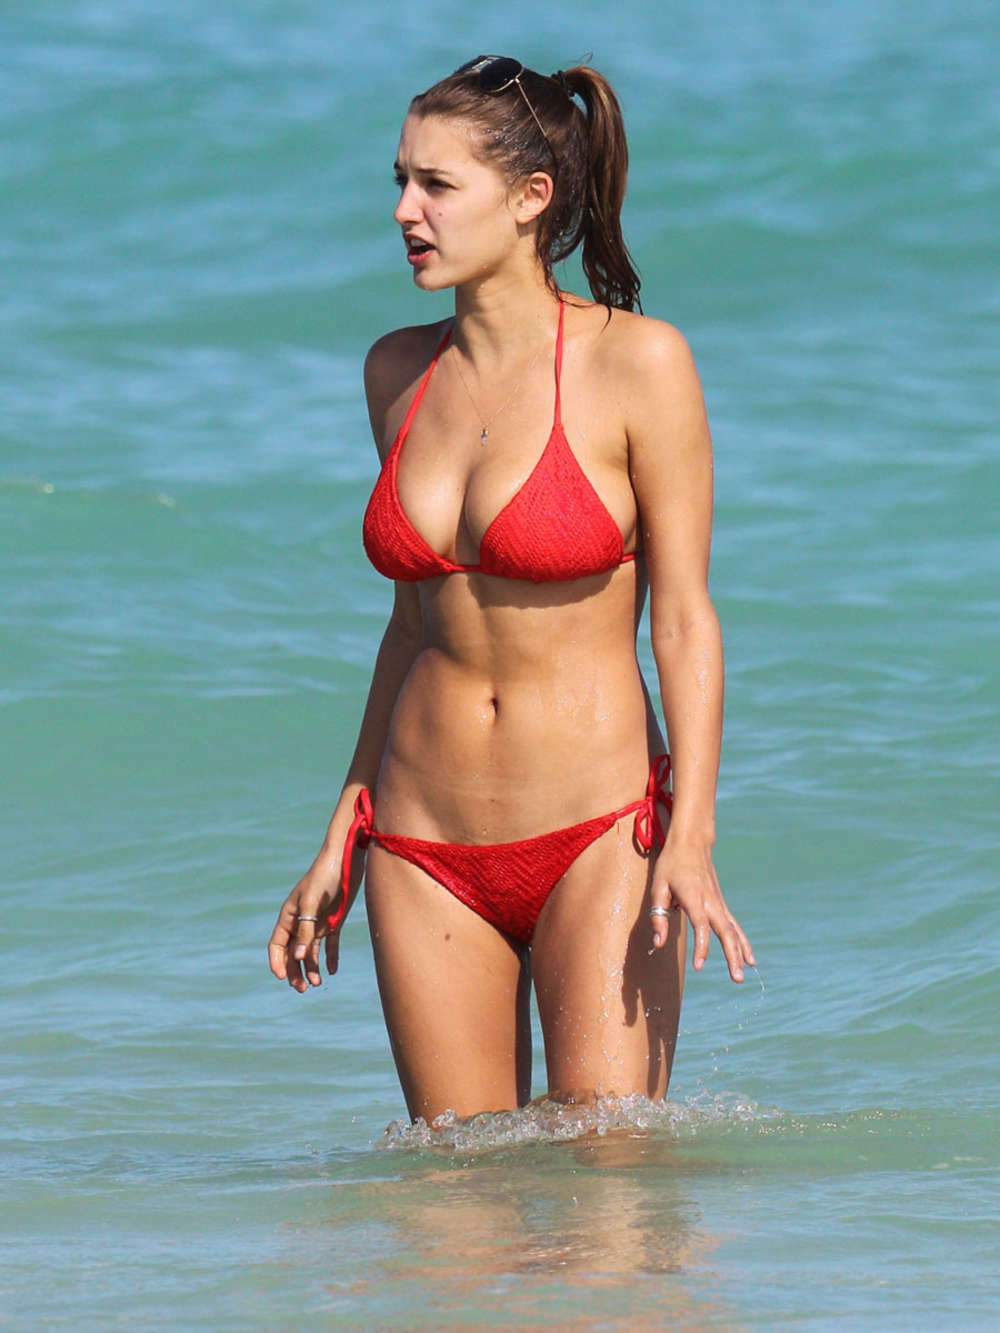 Hot Alyssa Arce nudes (49 pics), Bikini